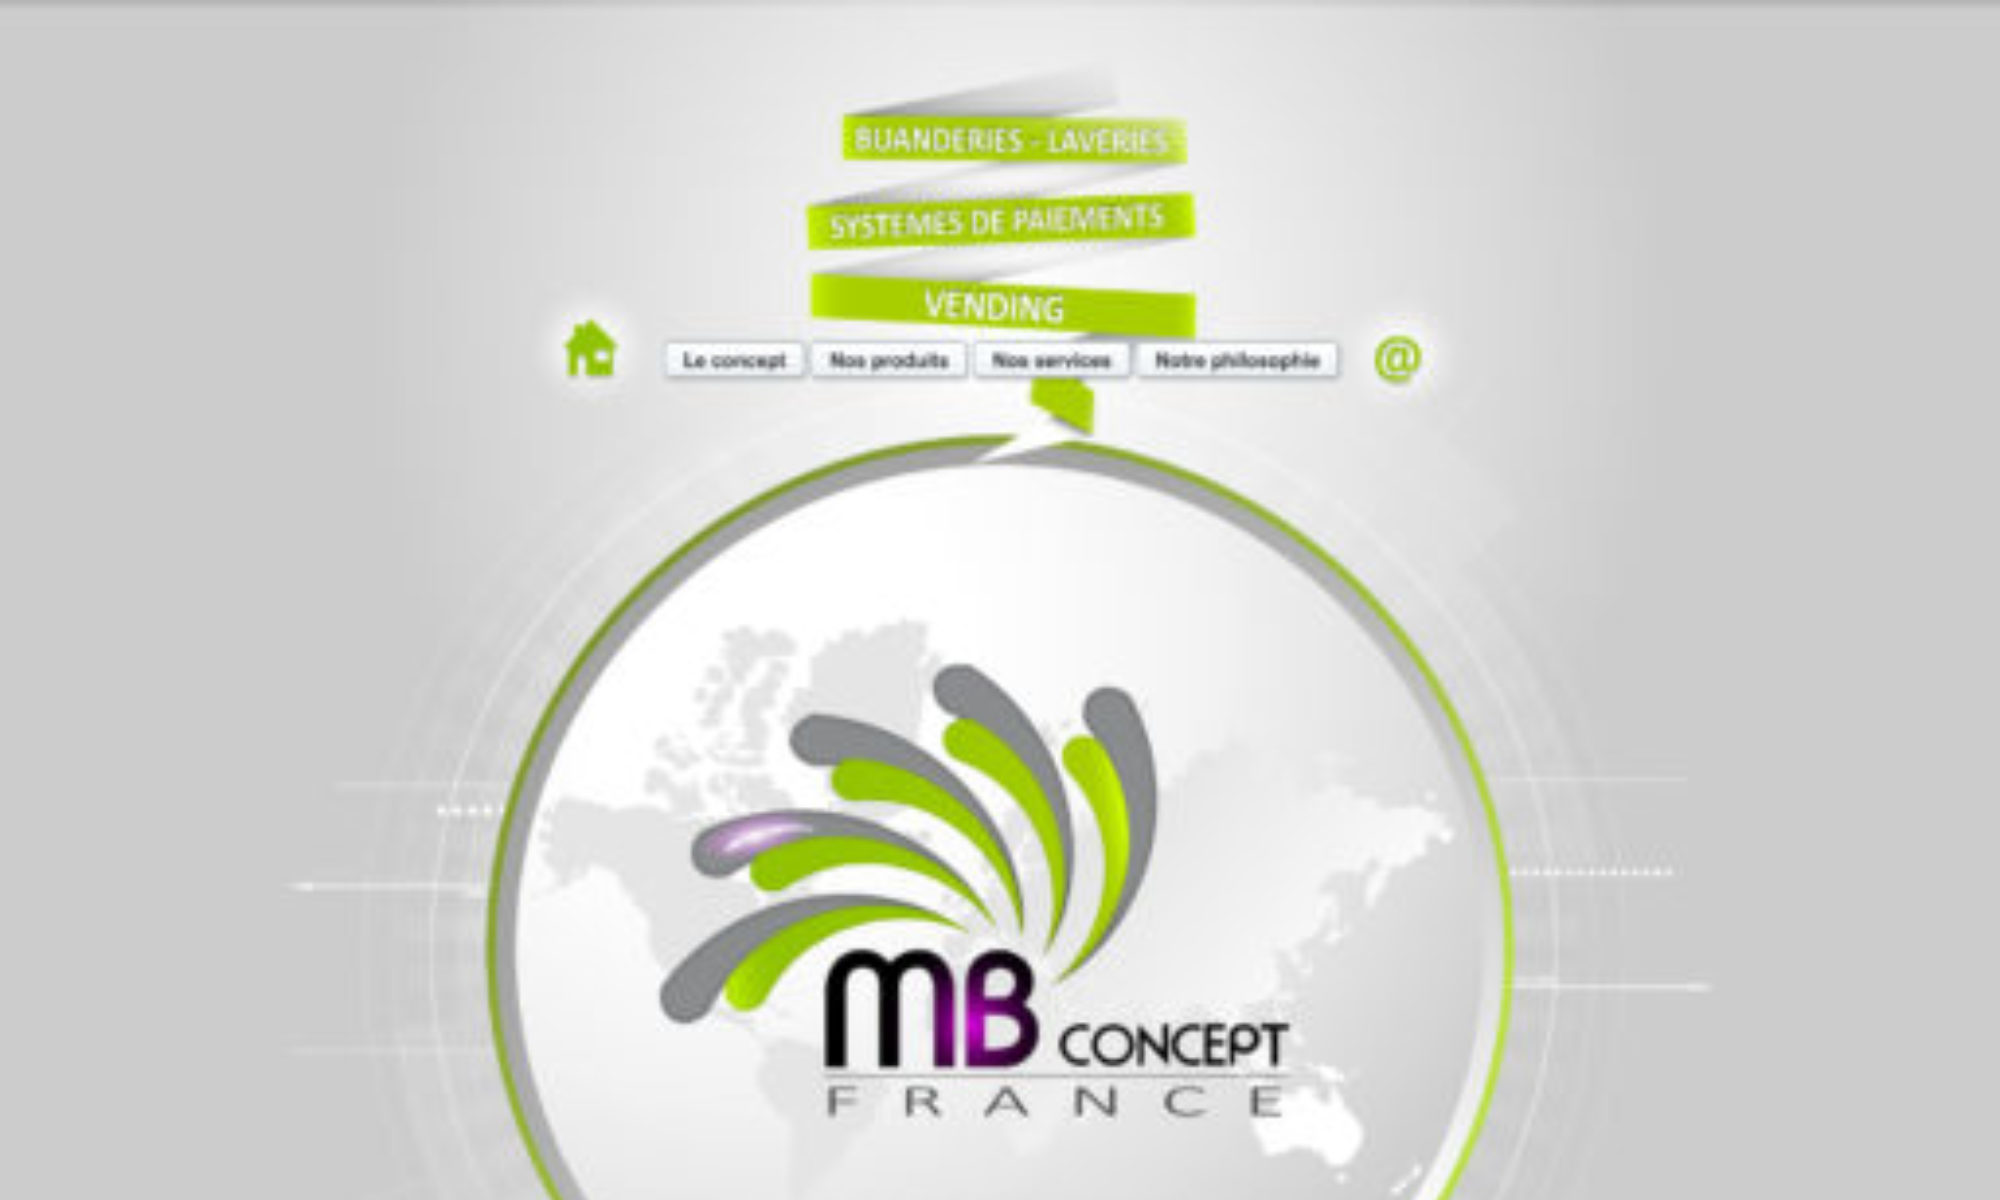 MB CONCEPT FRANCE